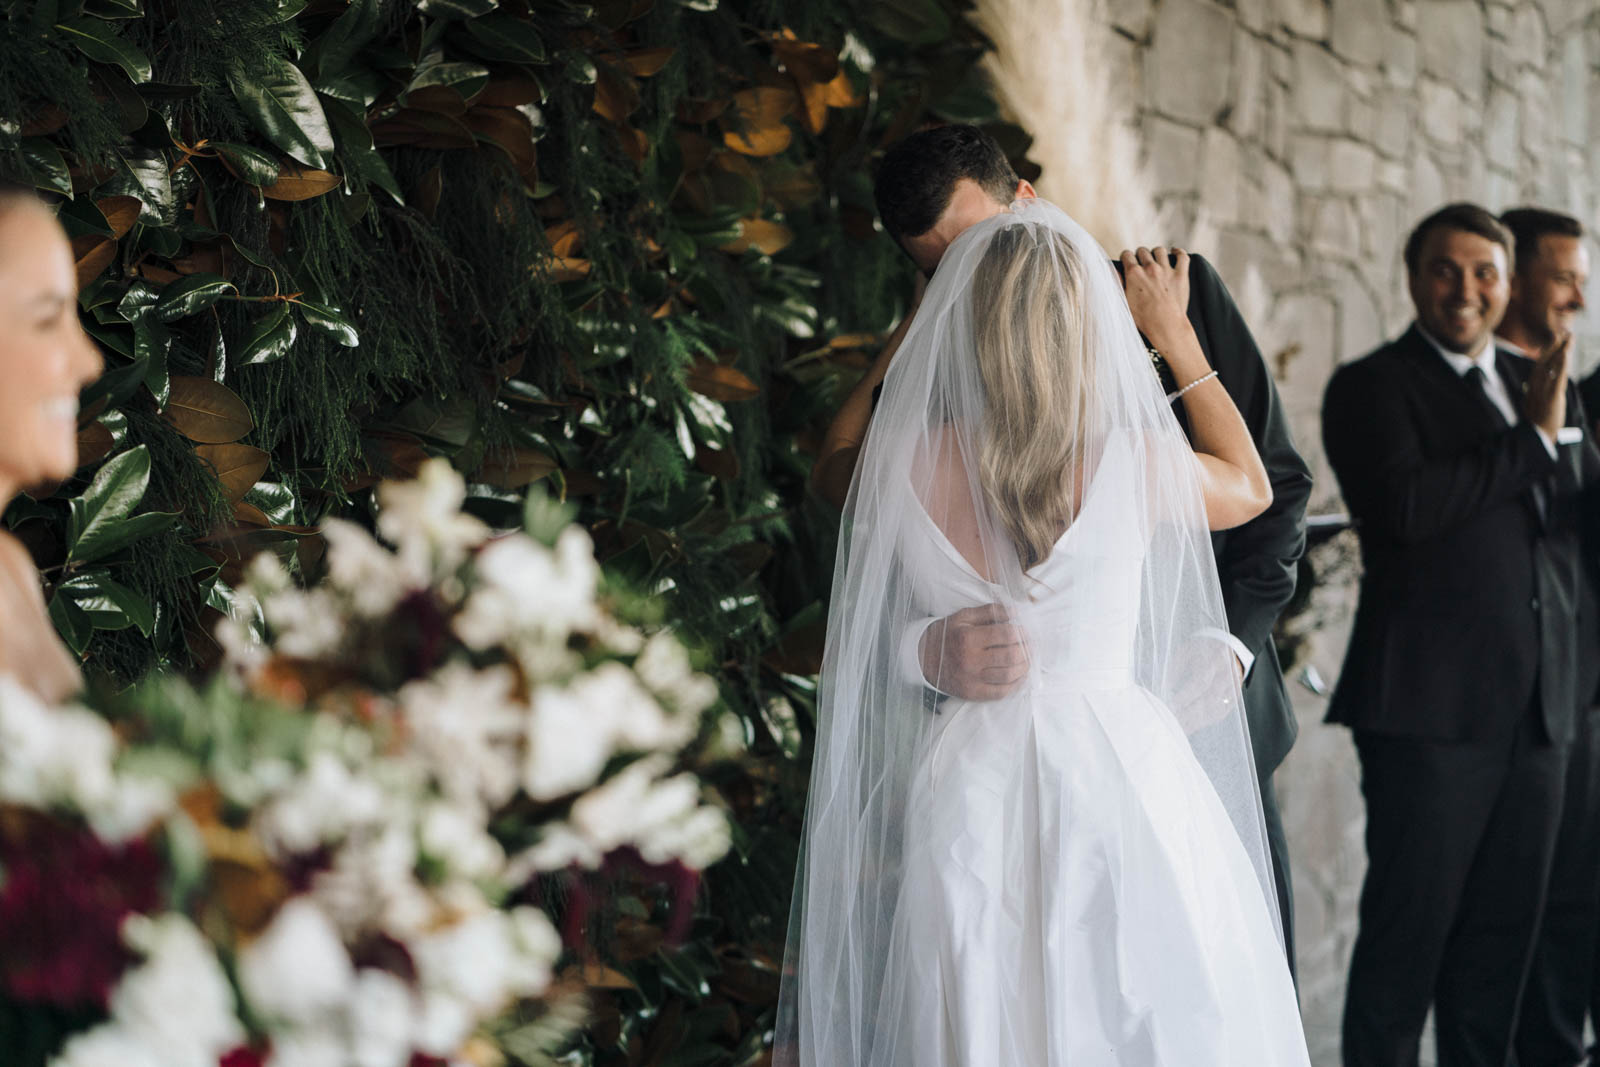 newfound-s-p-mt-maunganui-tauranga-wedding-photographer-1711-LQ100224